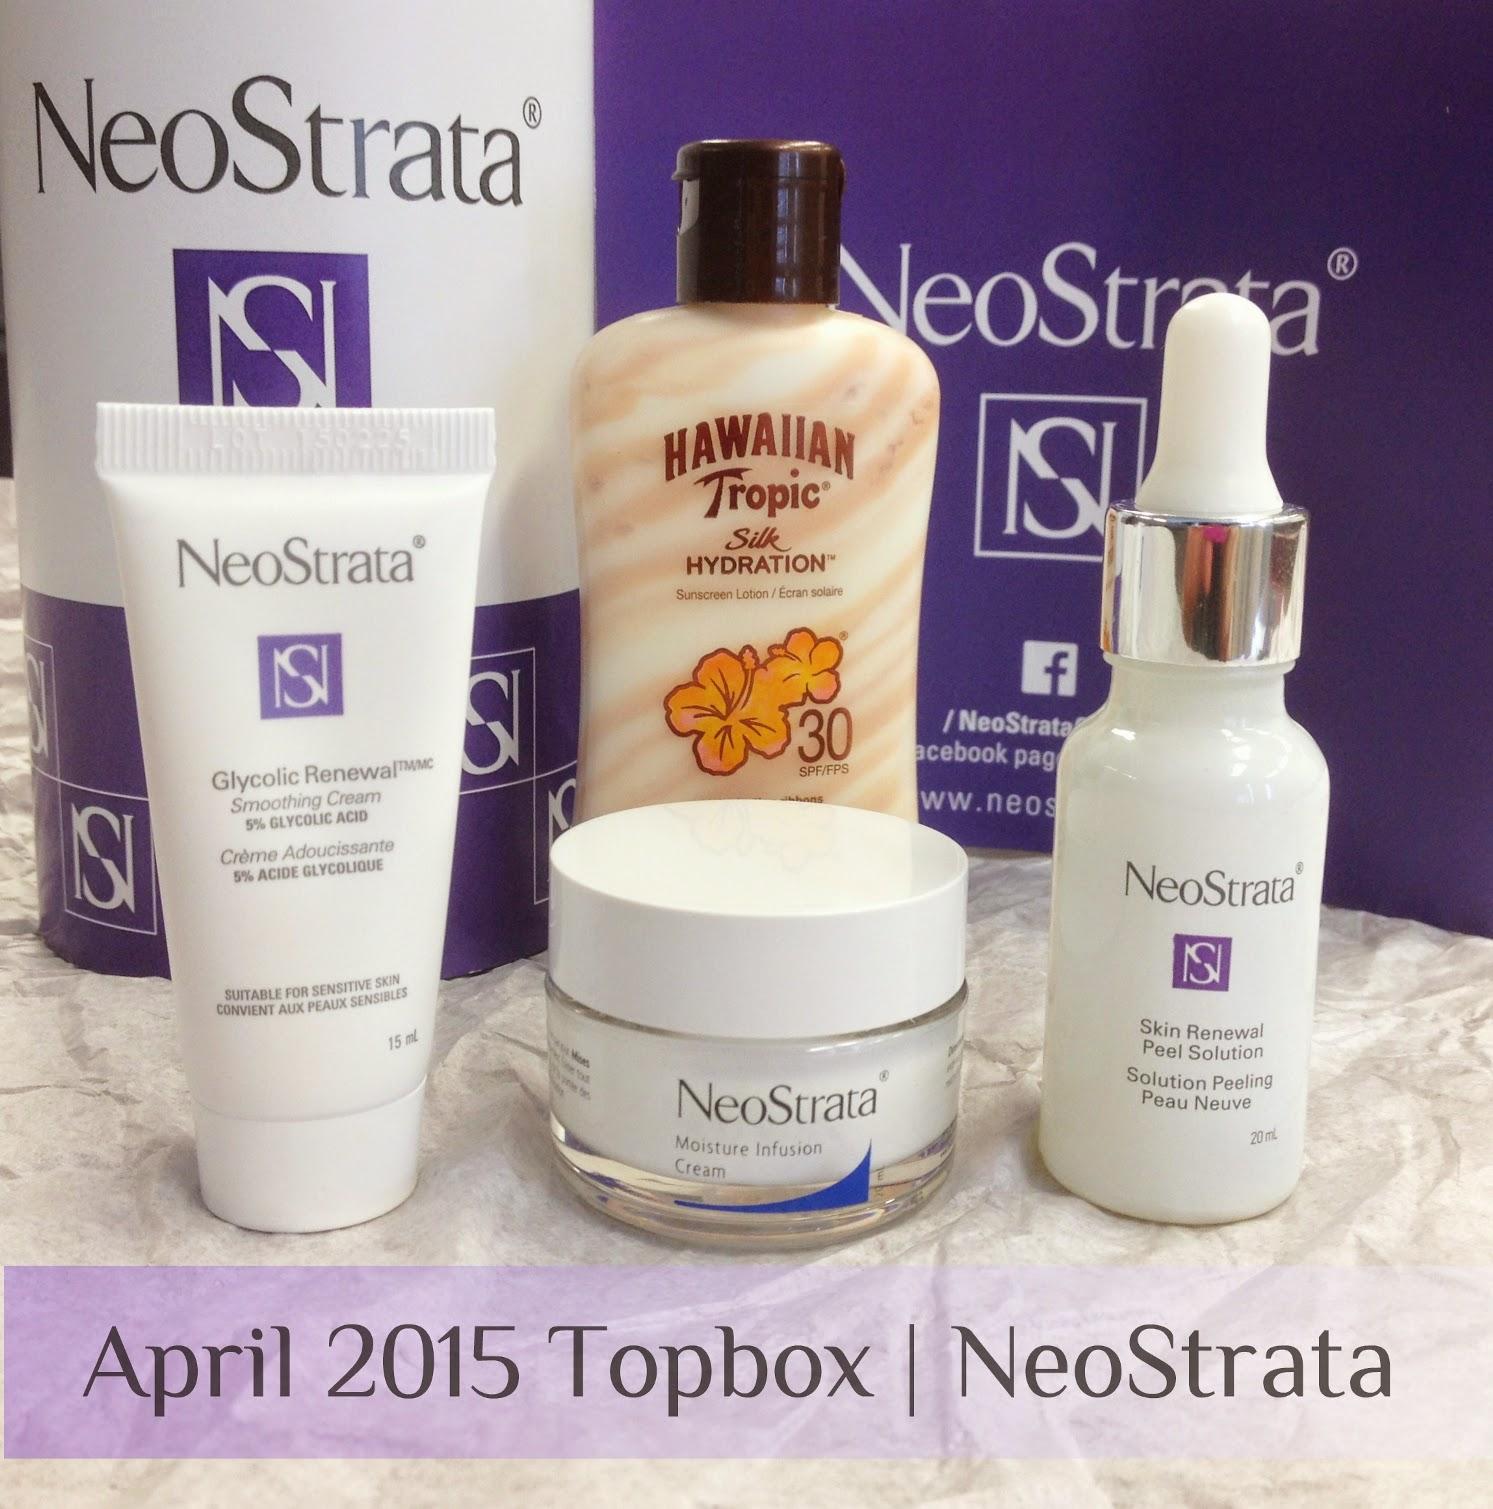 April 2015 Topbox